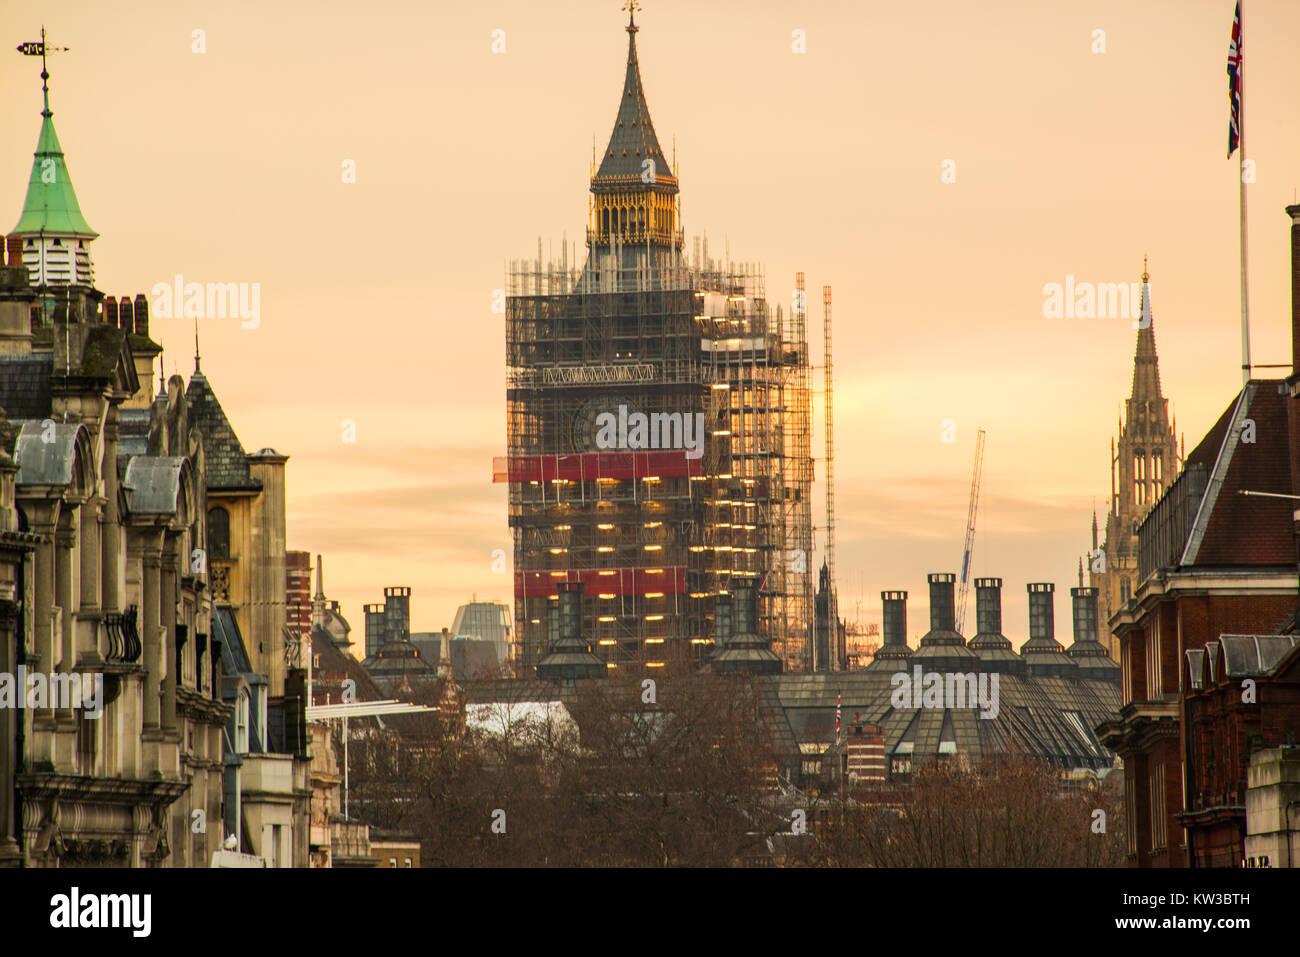 Big Ben undergoing renovation. Stock Photo